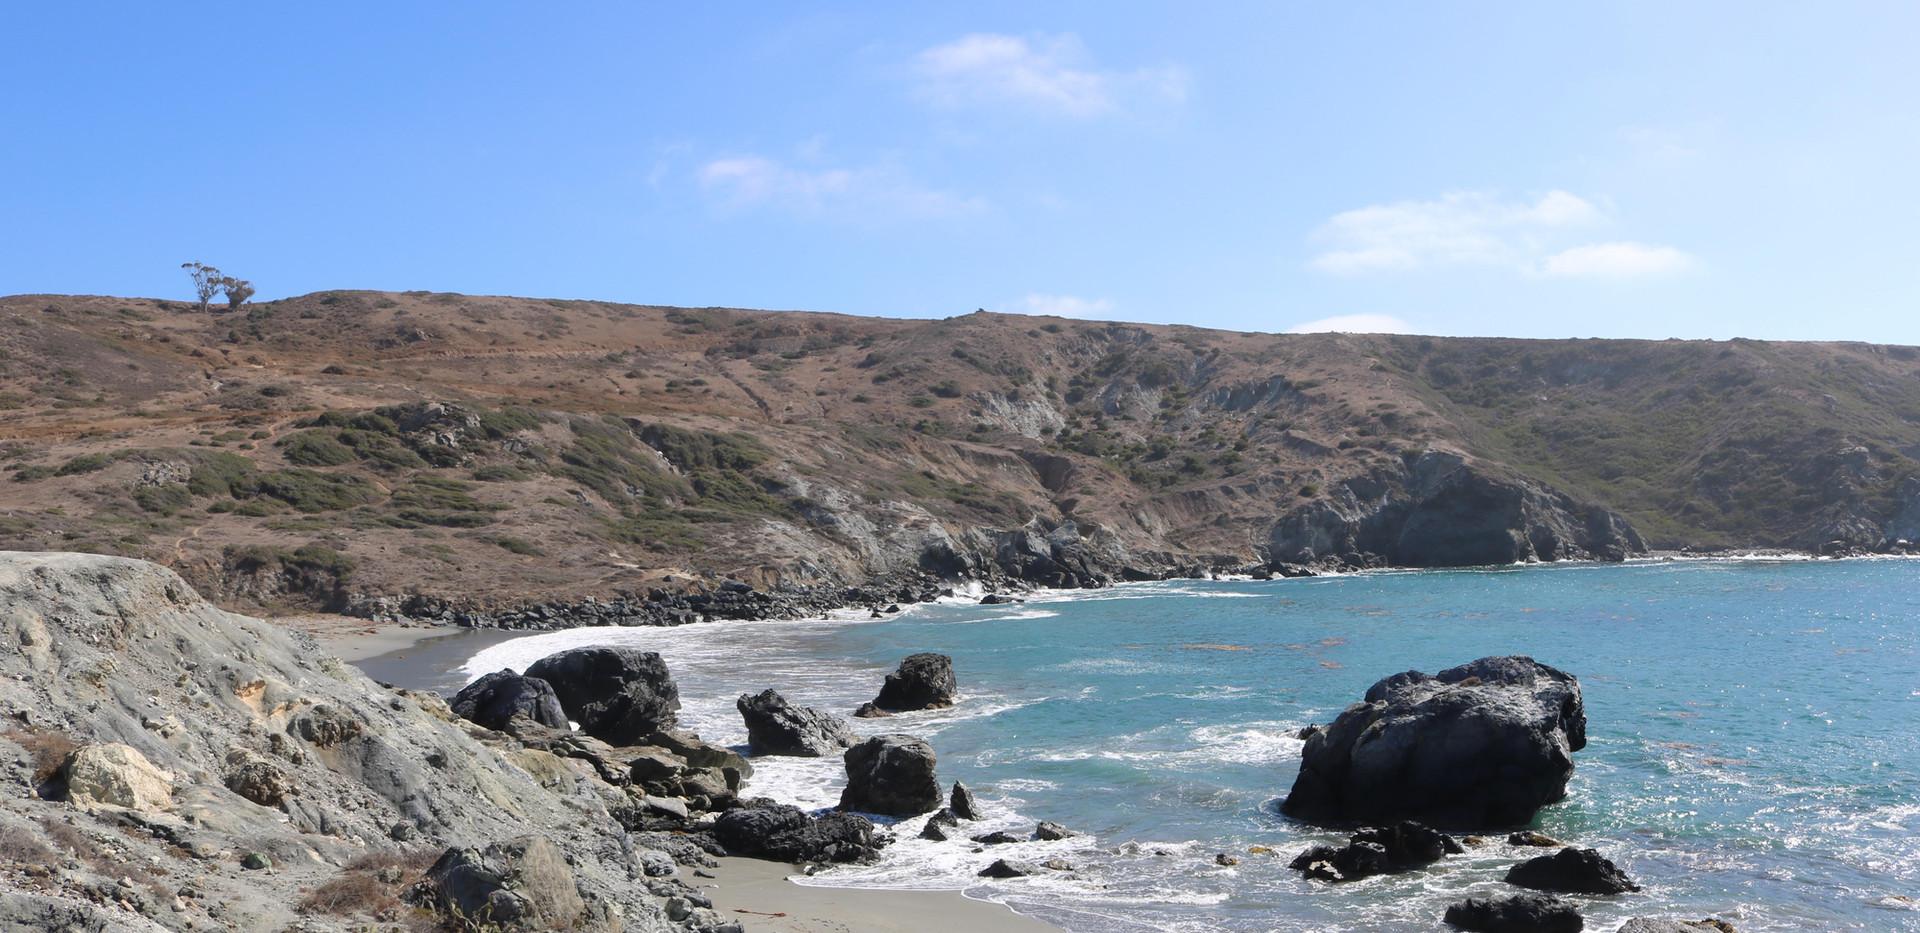 Hiking on Catalina Island